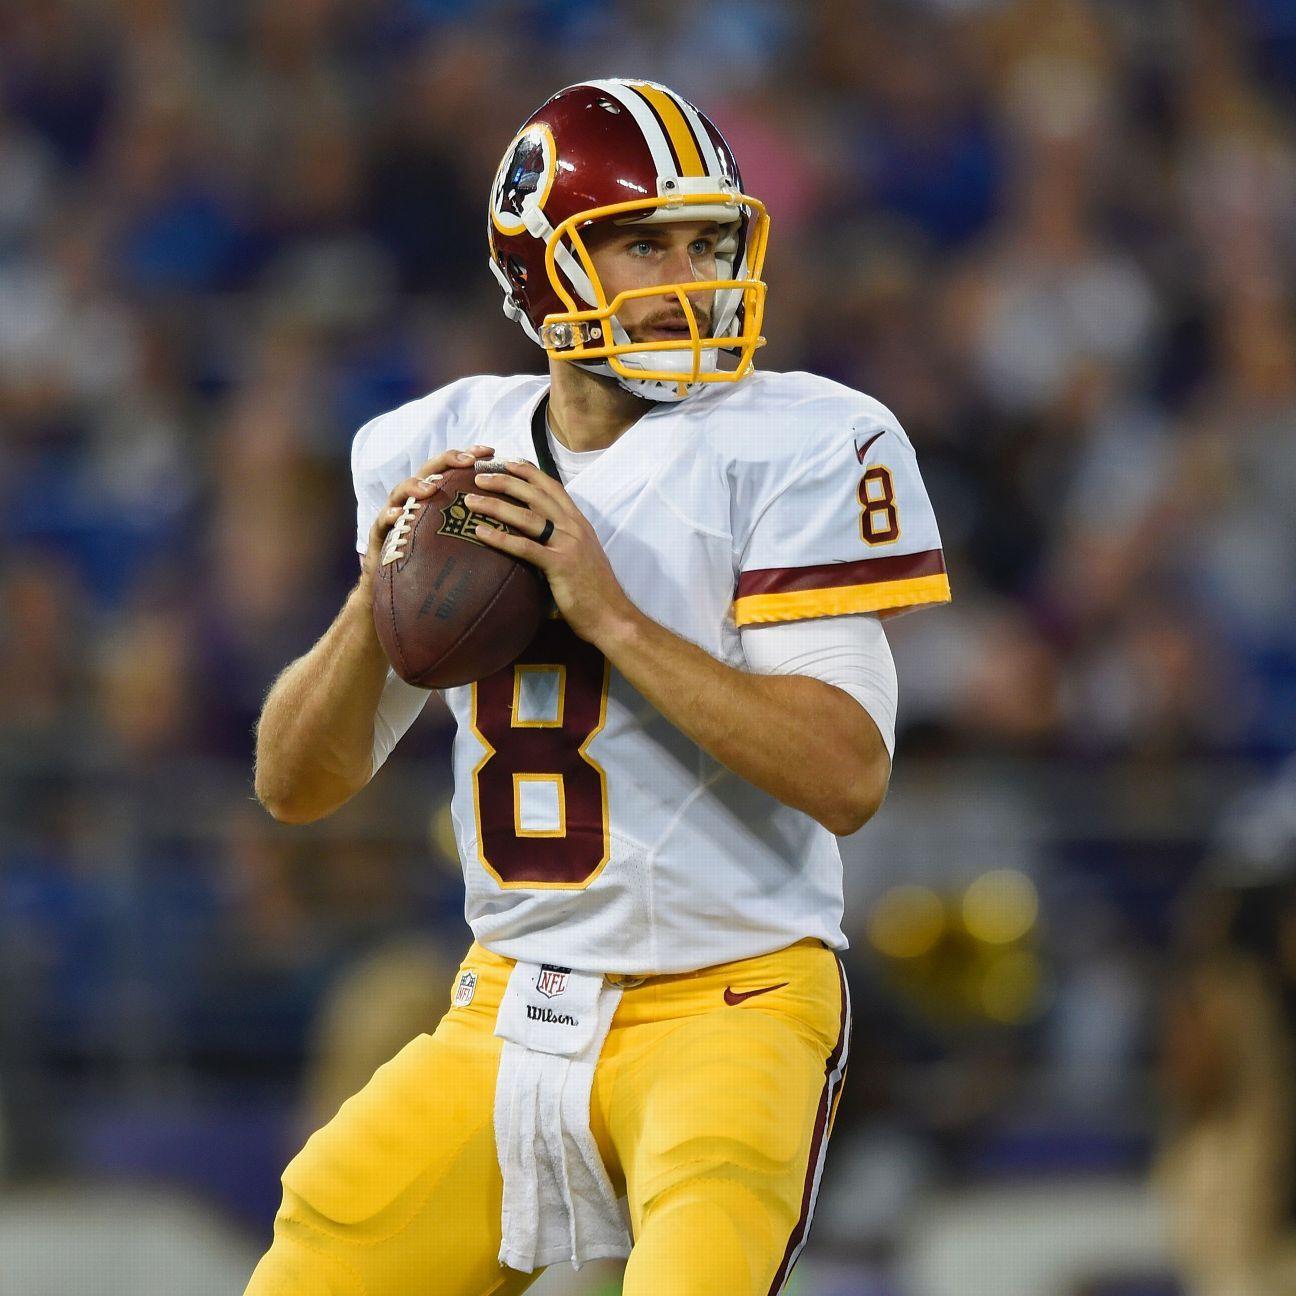 Kirk Cousins will be the Washington Redskins' starting quarterback ...